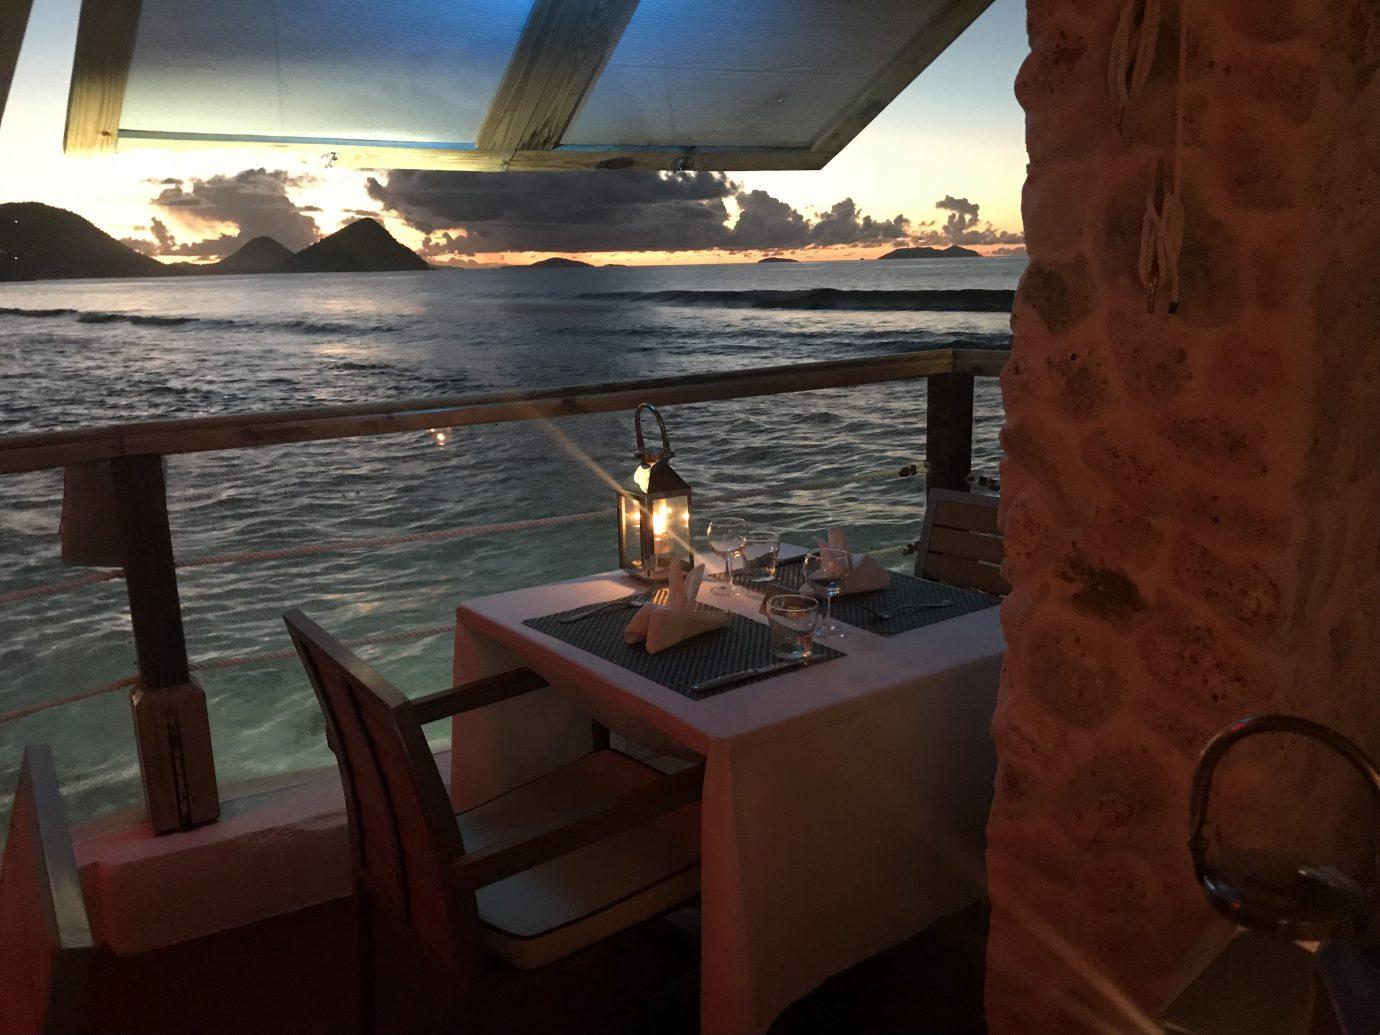 dining at dusk